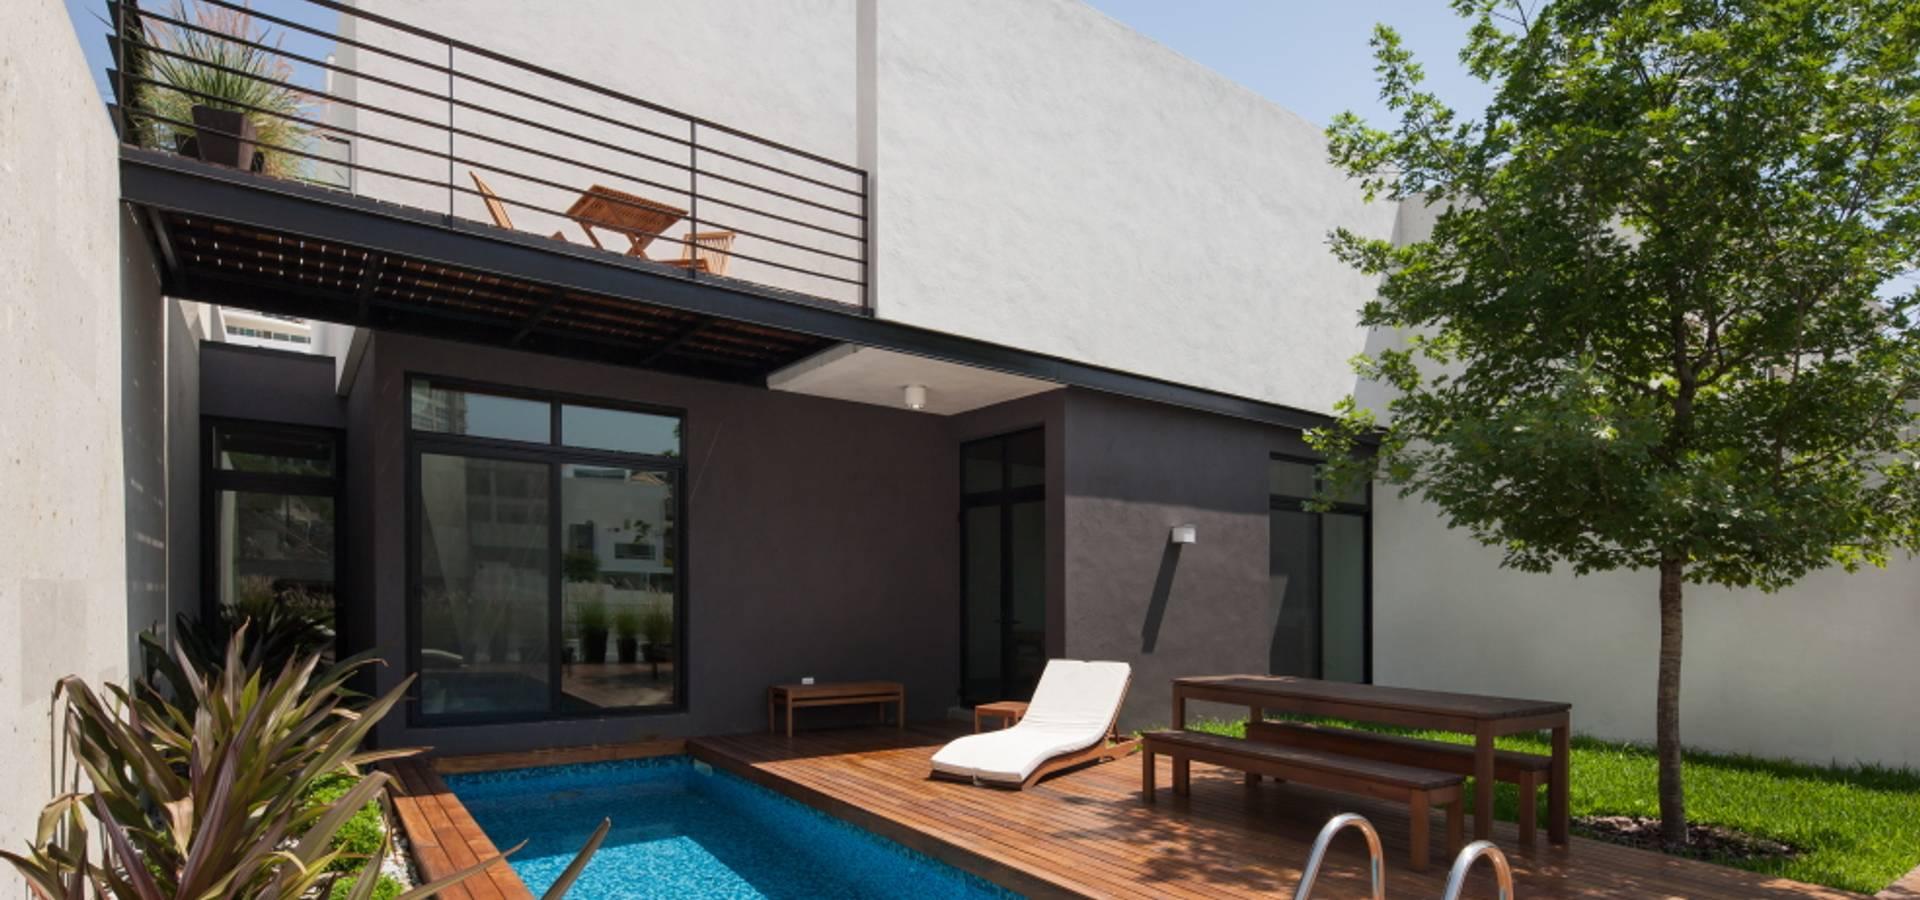 LGZ Taller de arquitectura